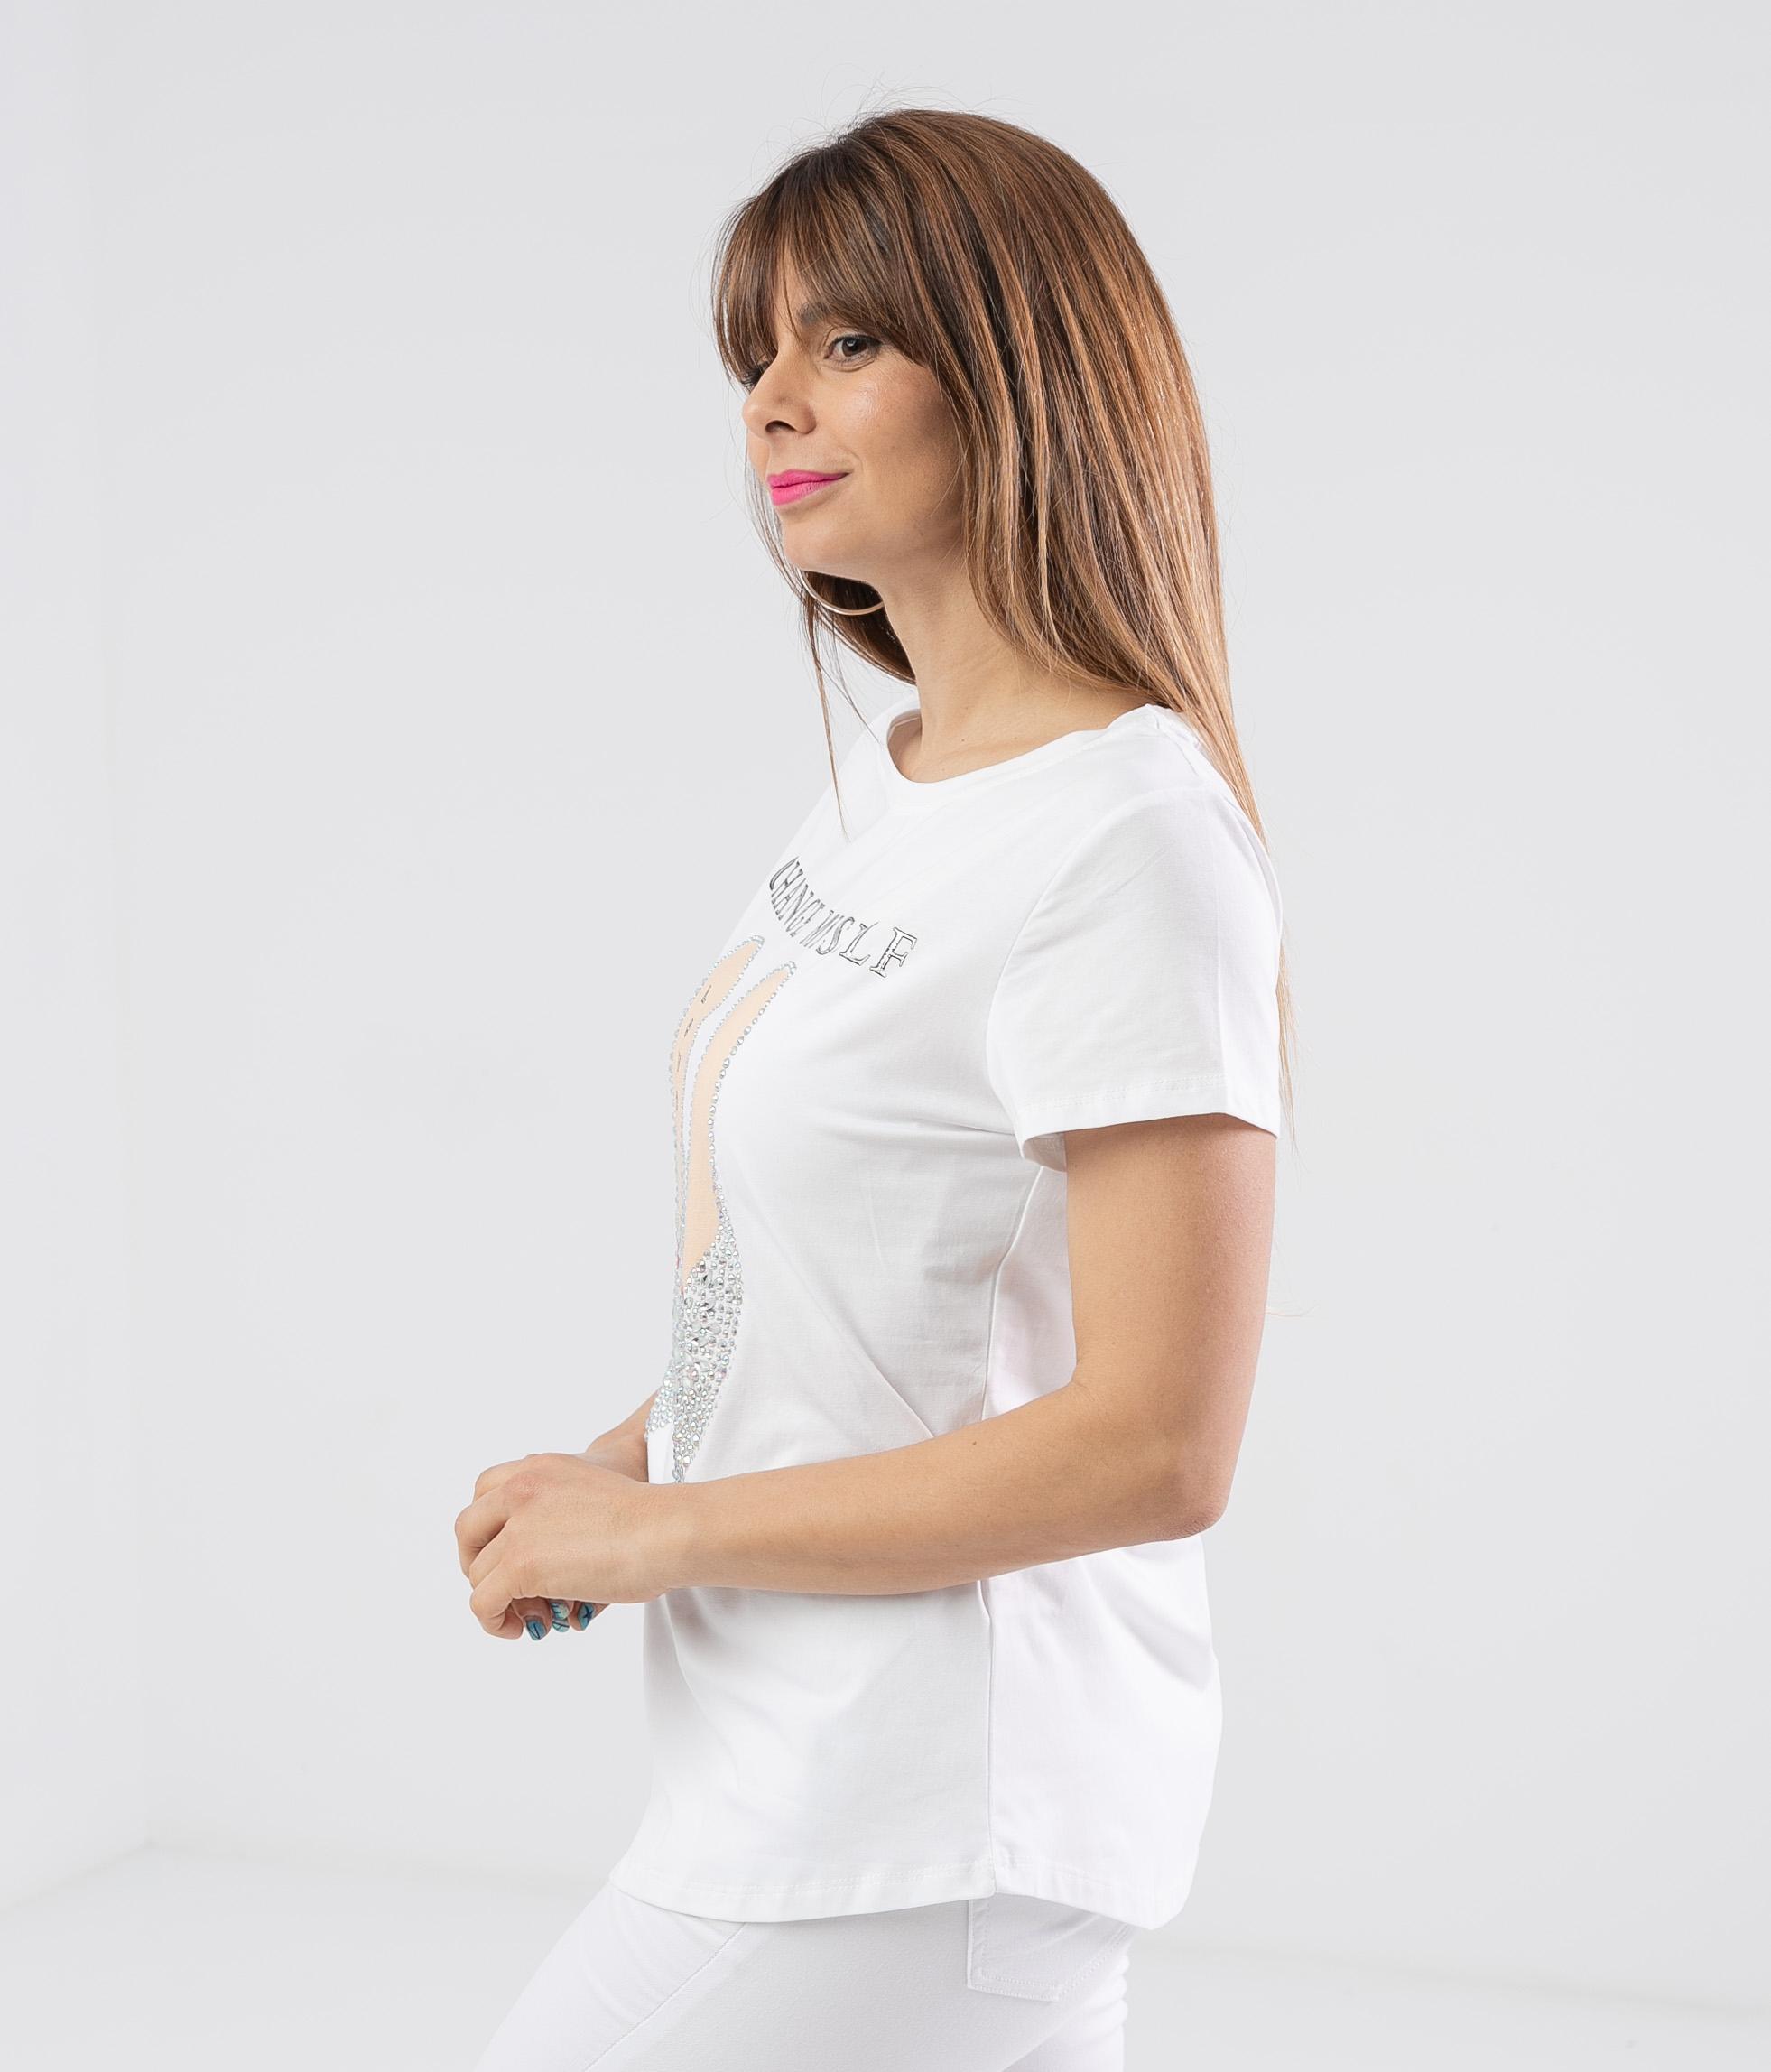 Brines Selin - White